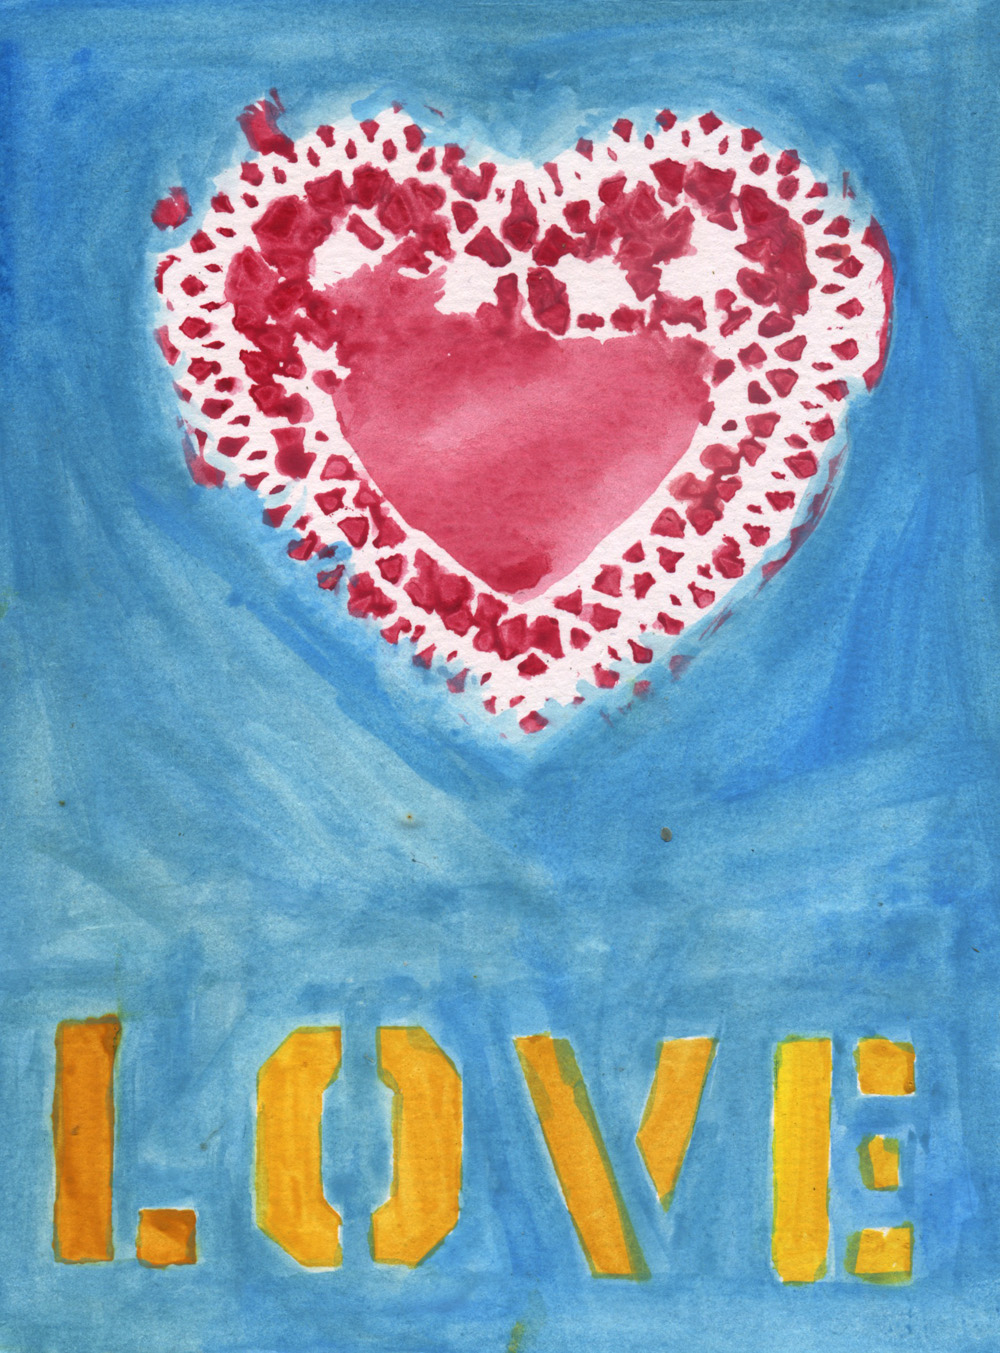 LoveCard.jpg